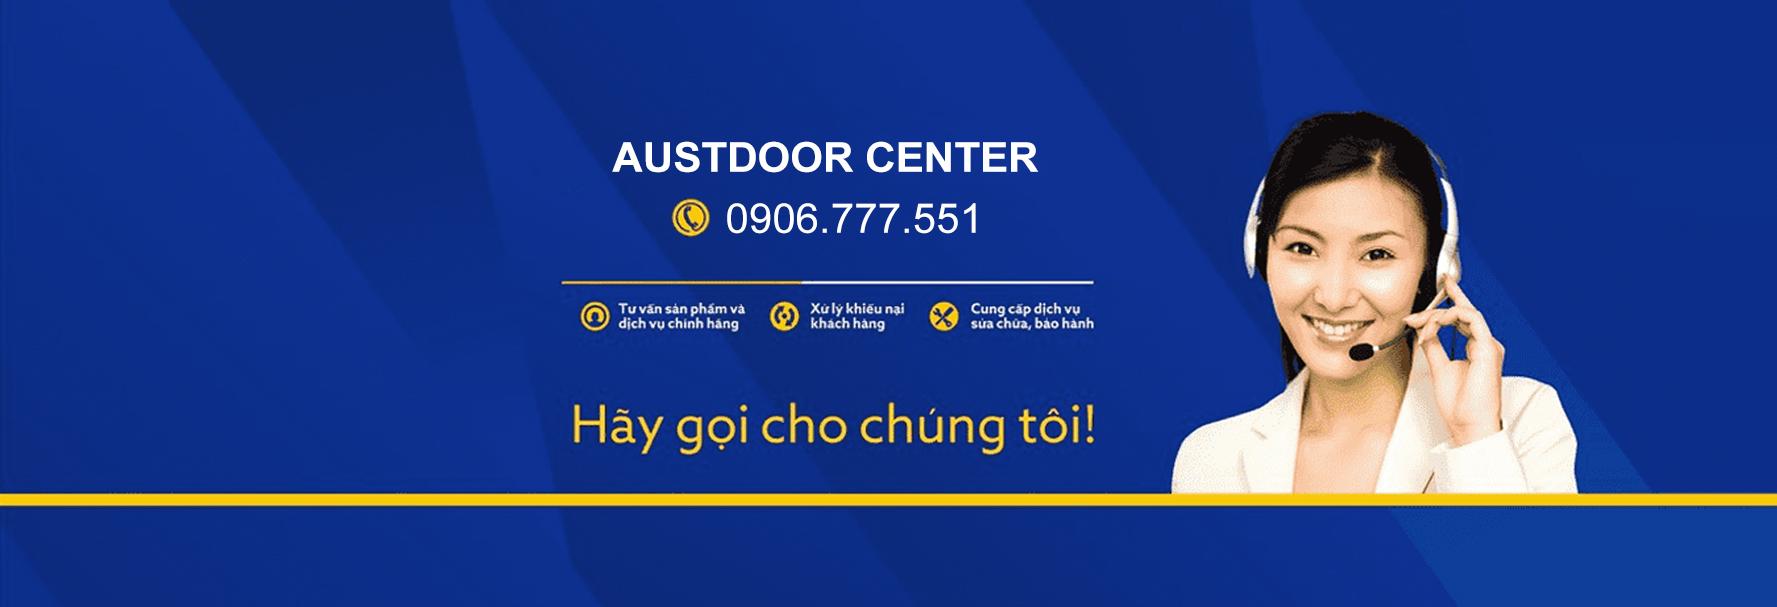 Austdoor Center